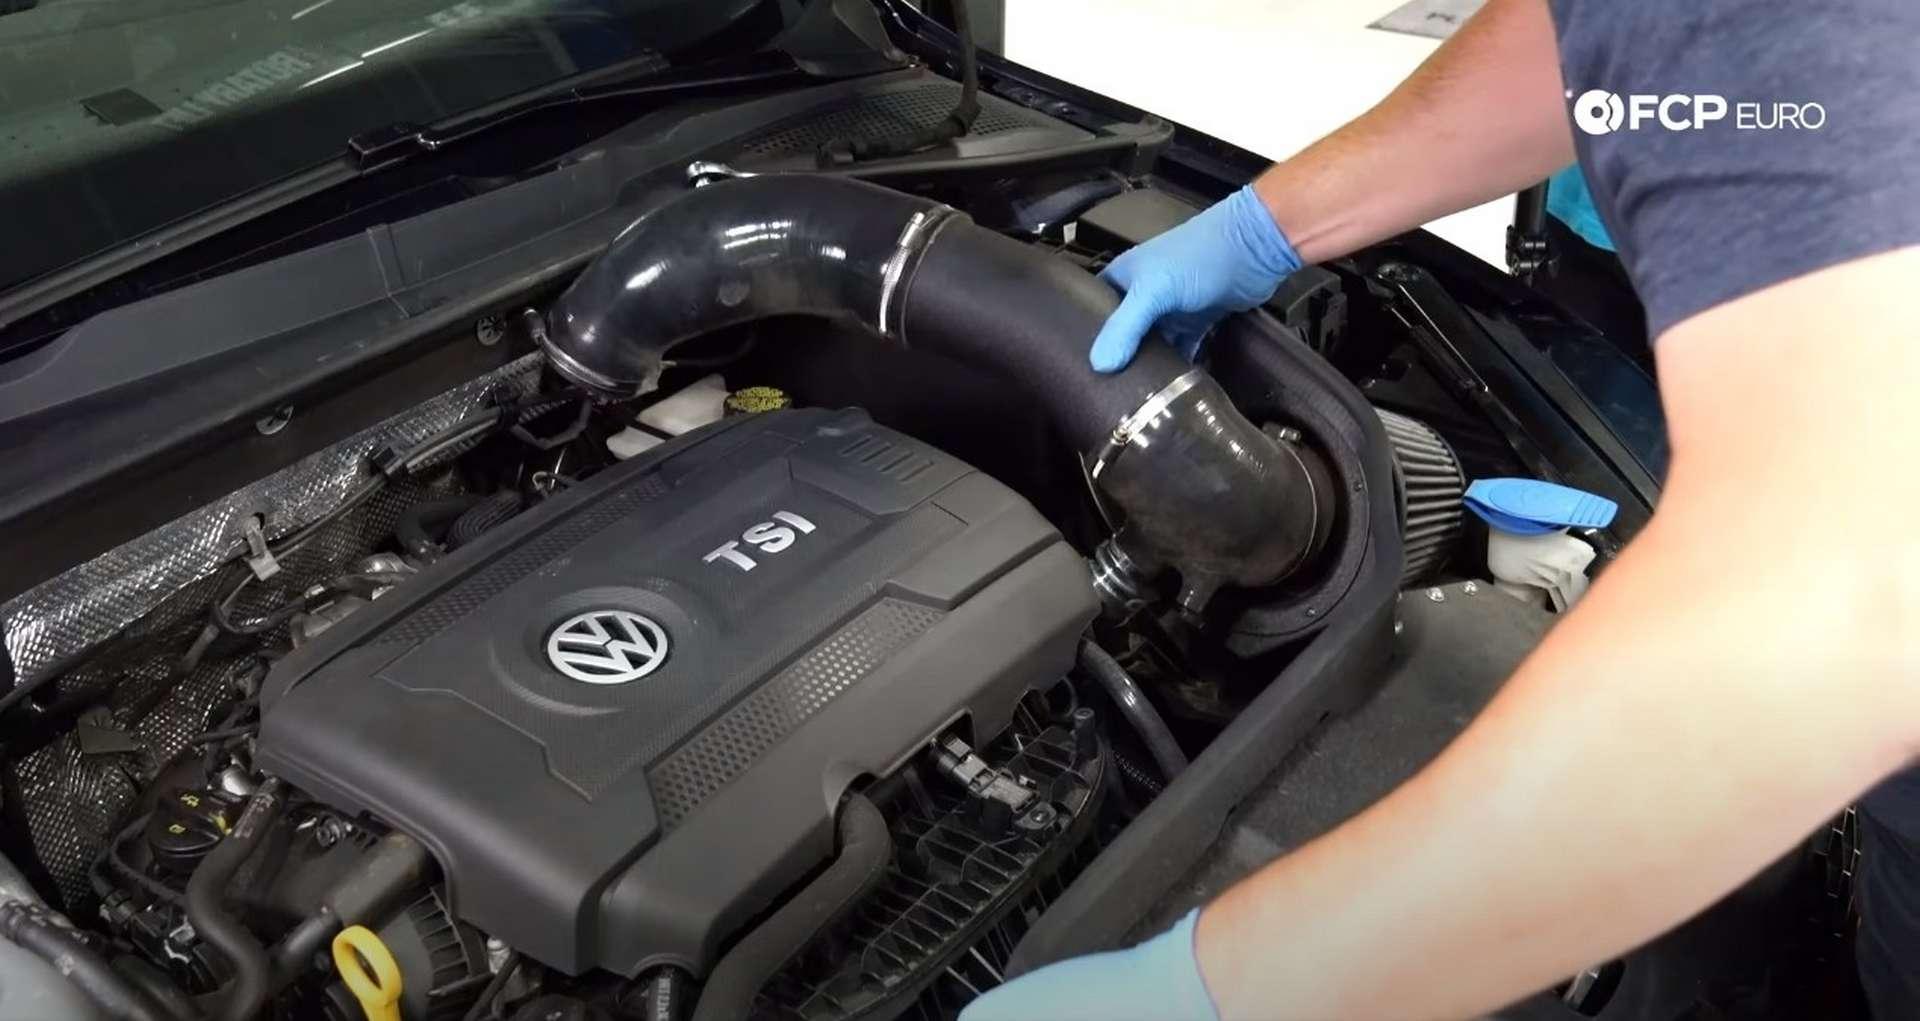 03-DIY_VW_GTI_Clutch-Job-Removing-Intake